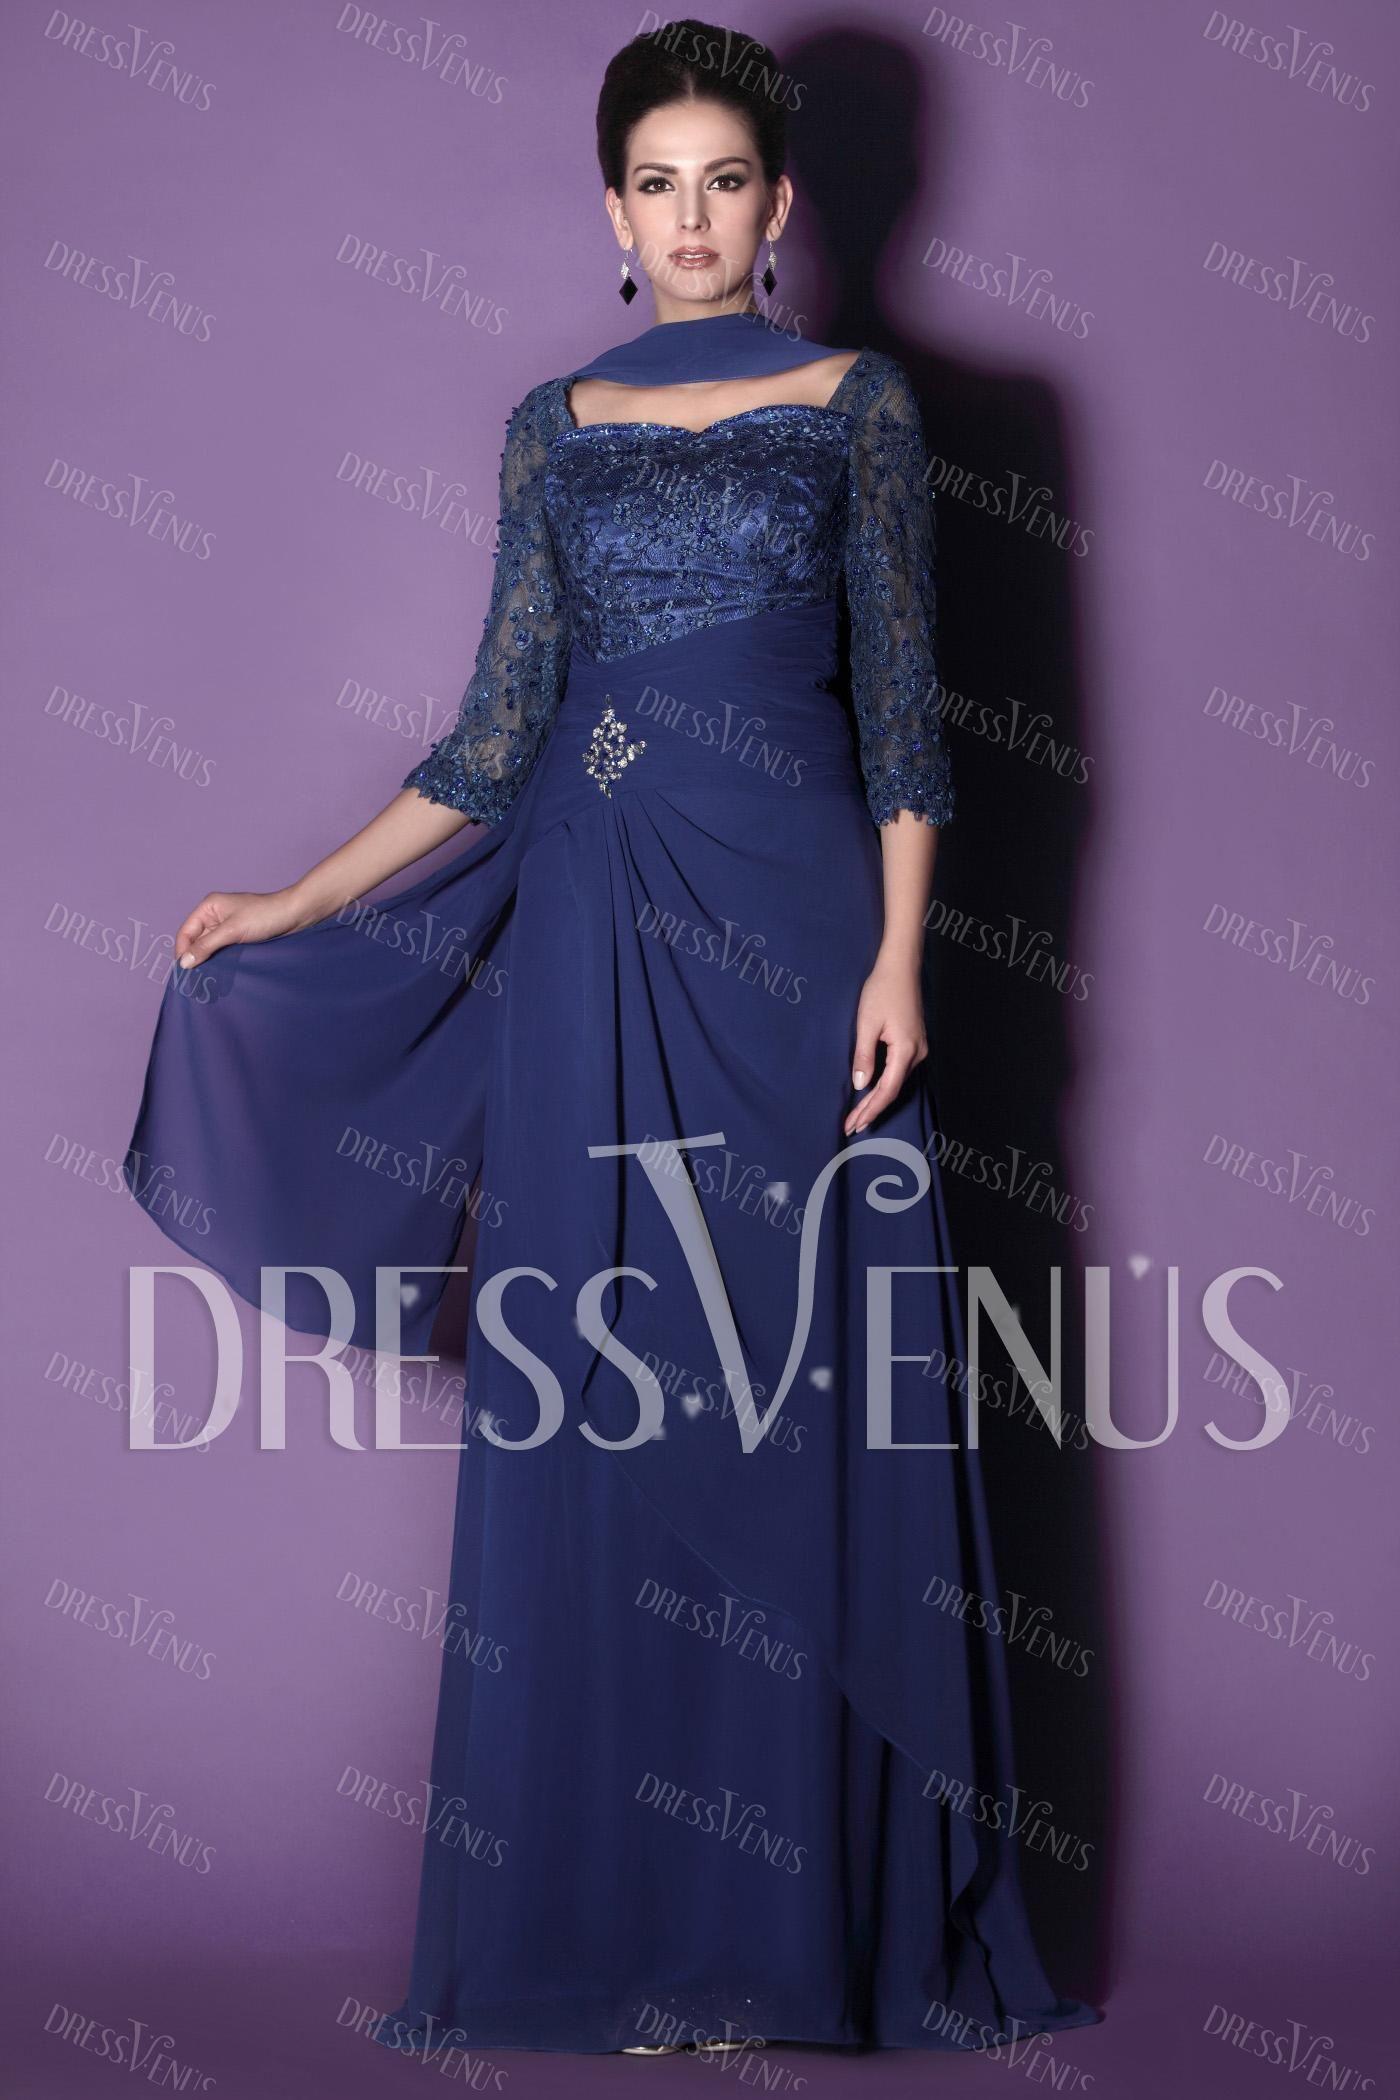 Dark royal blue,chiffon,elegant dresses | Wedding party dresses ...